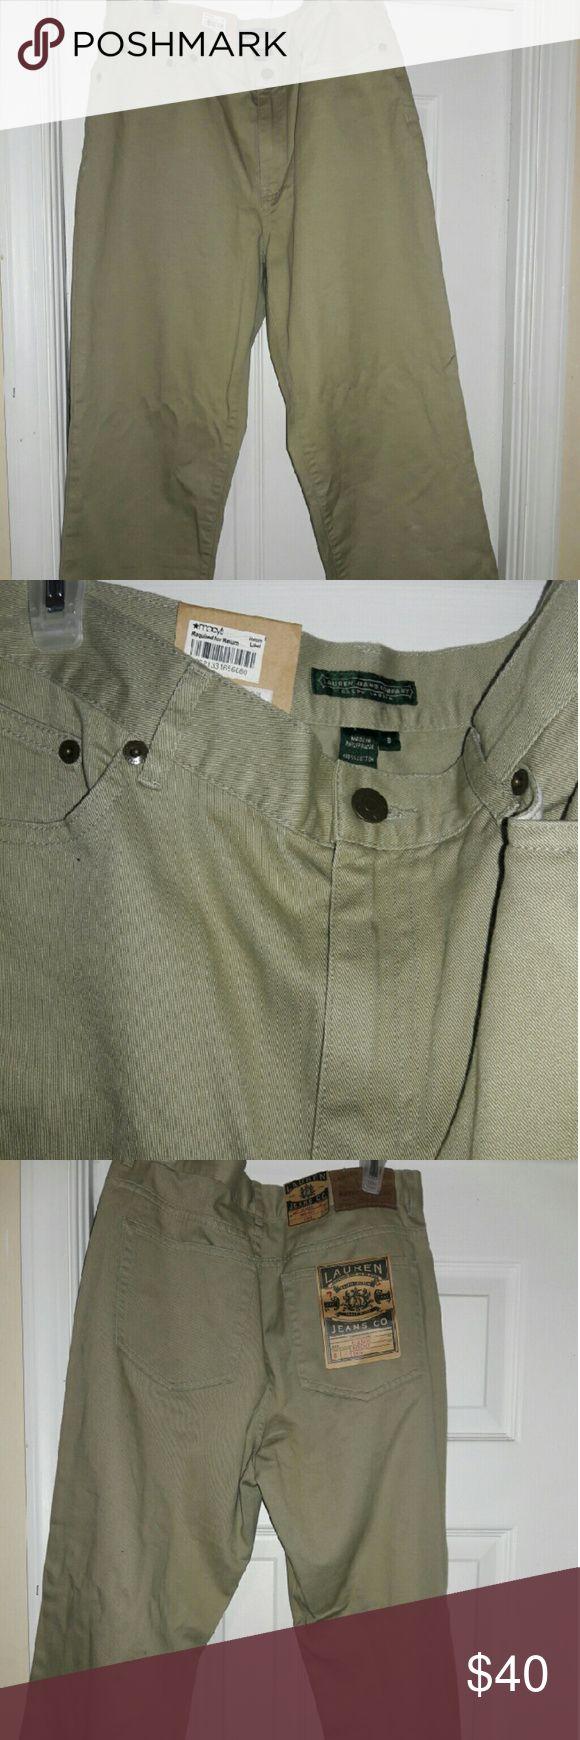 Polo ralph Lauren womens chino pants Brand new khaki womand Ralph Lauren chino Capri  pants Ralph Lauren Pants Capris